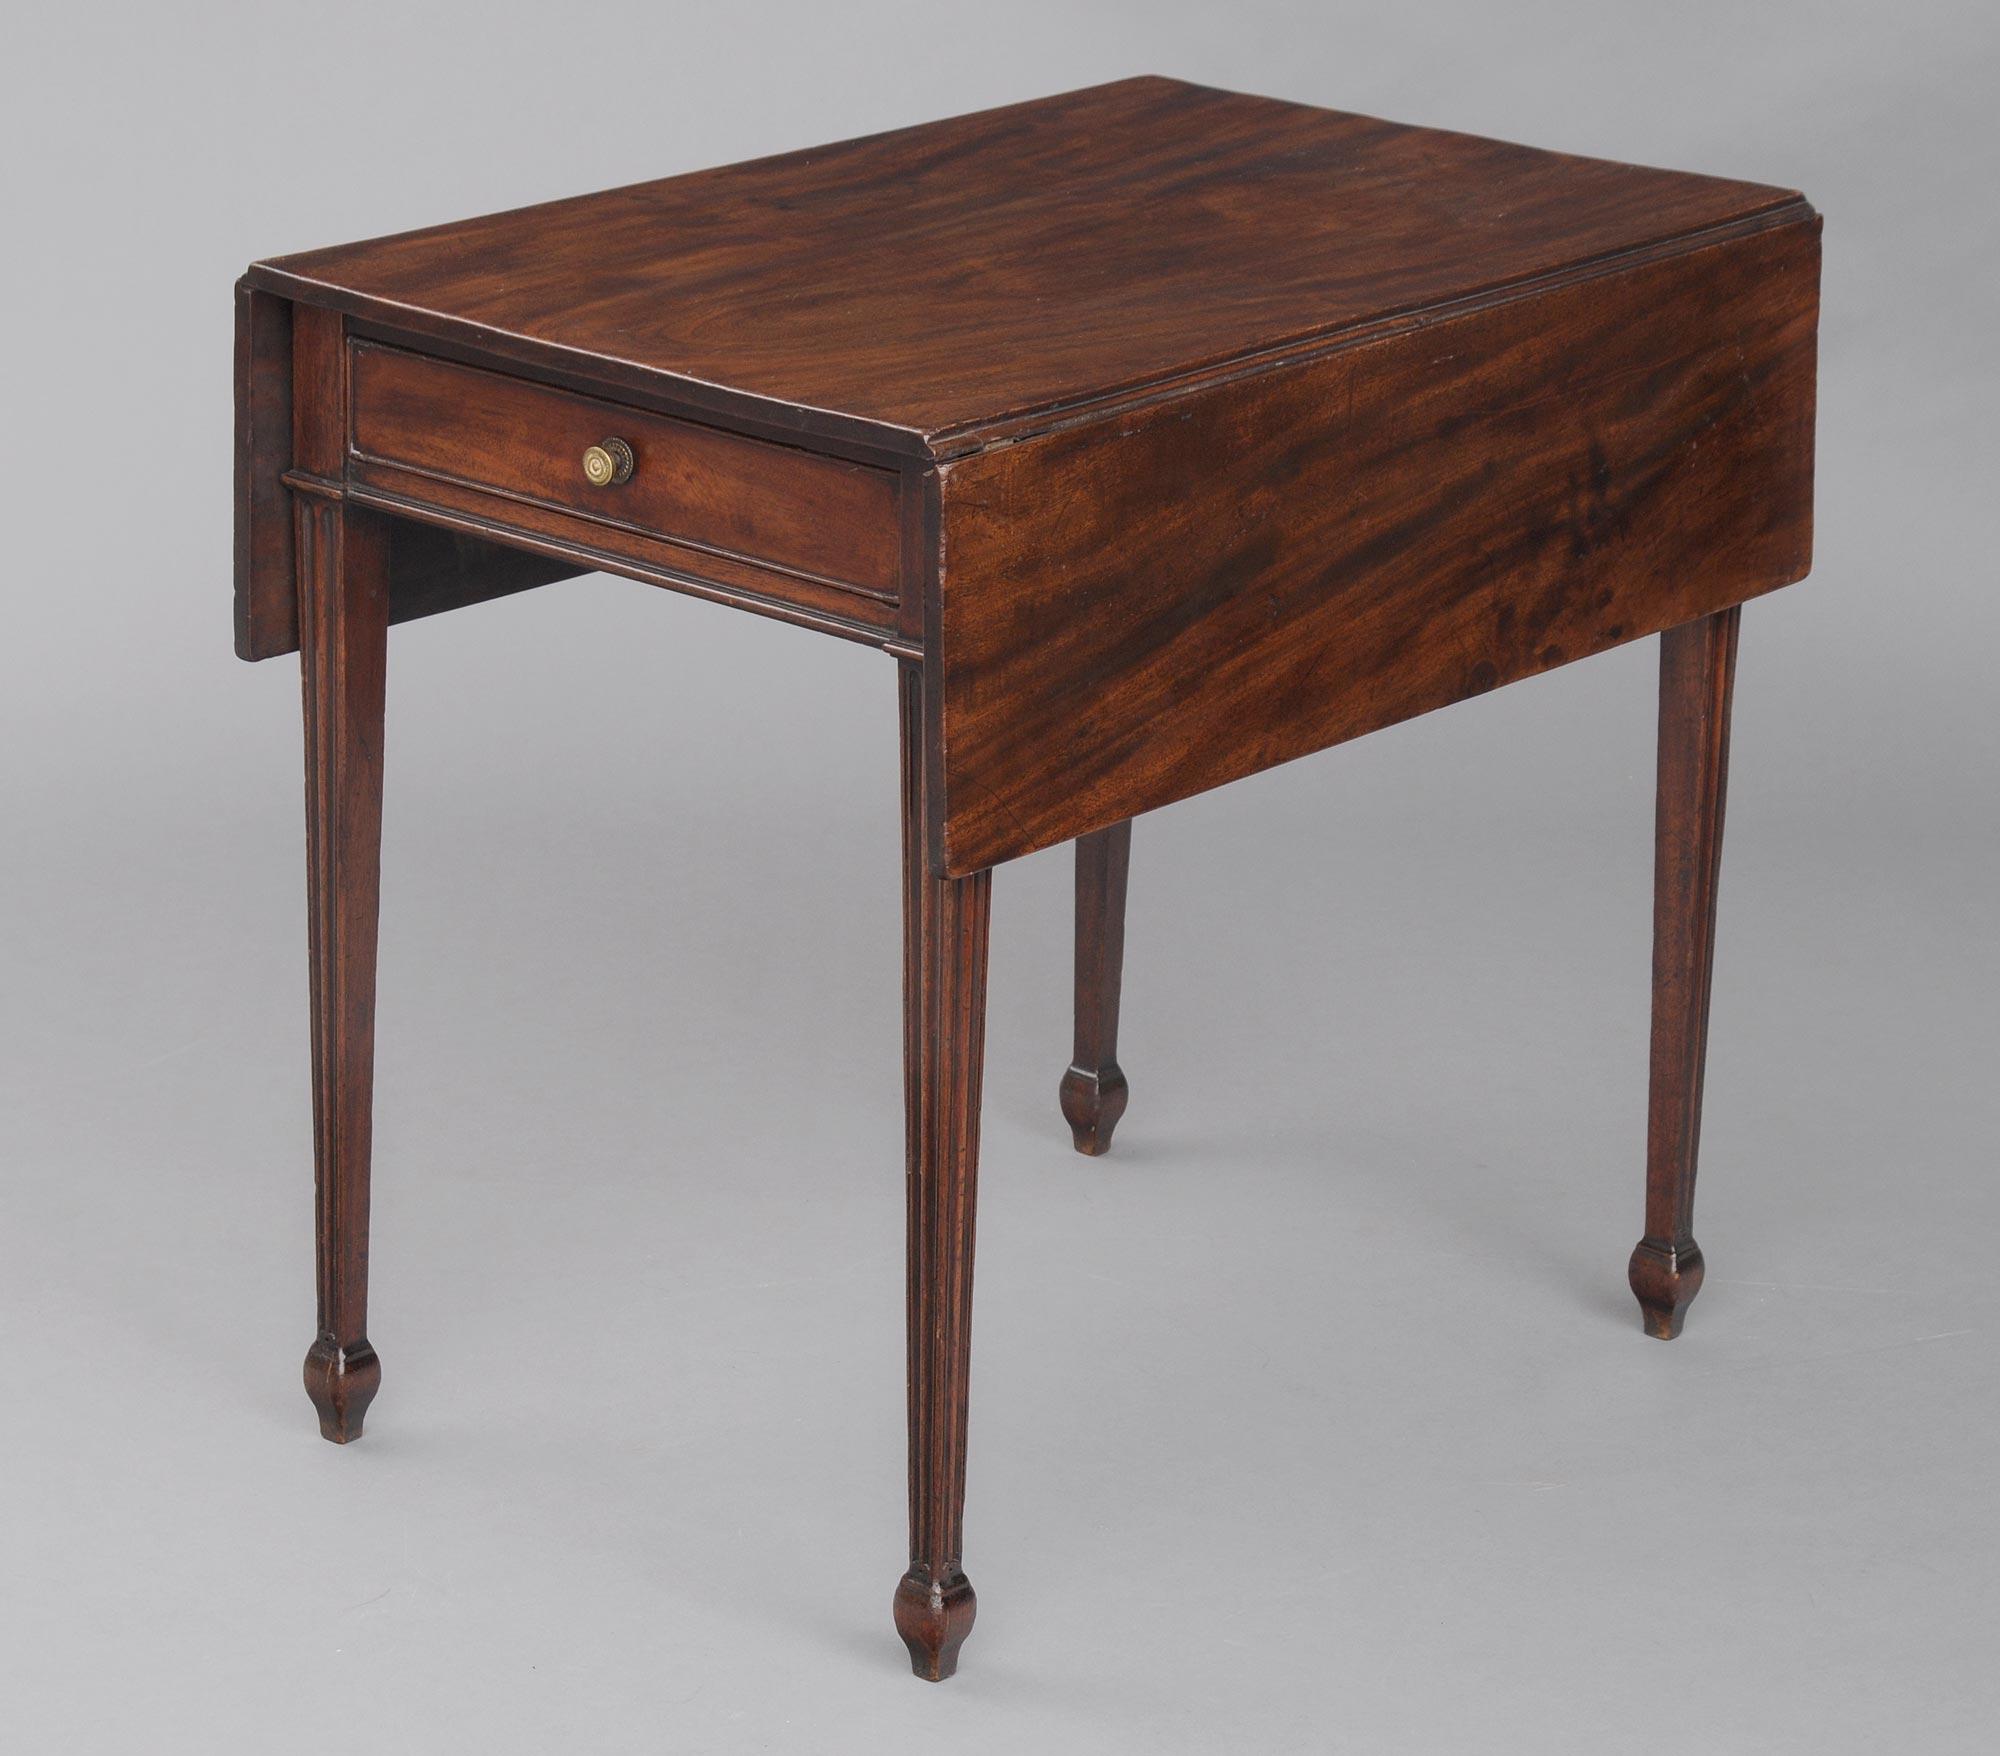 187 Product 187 Georgian Pembroke Table